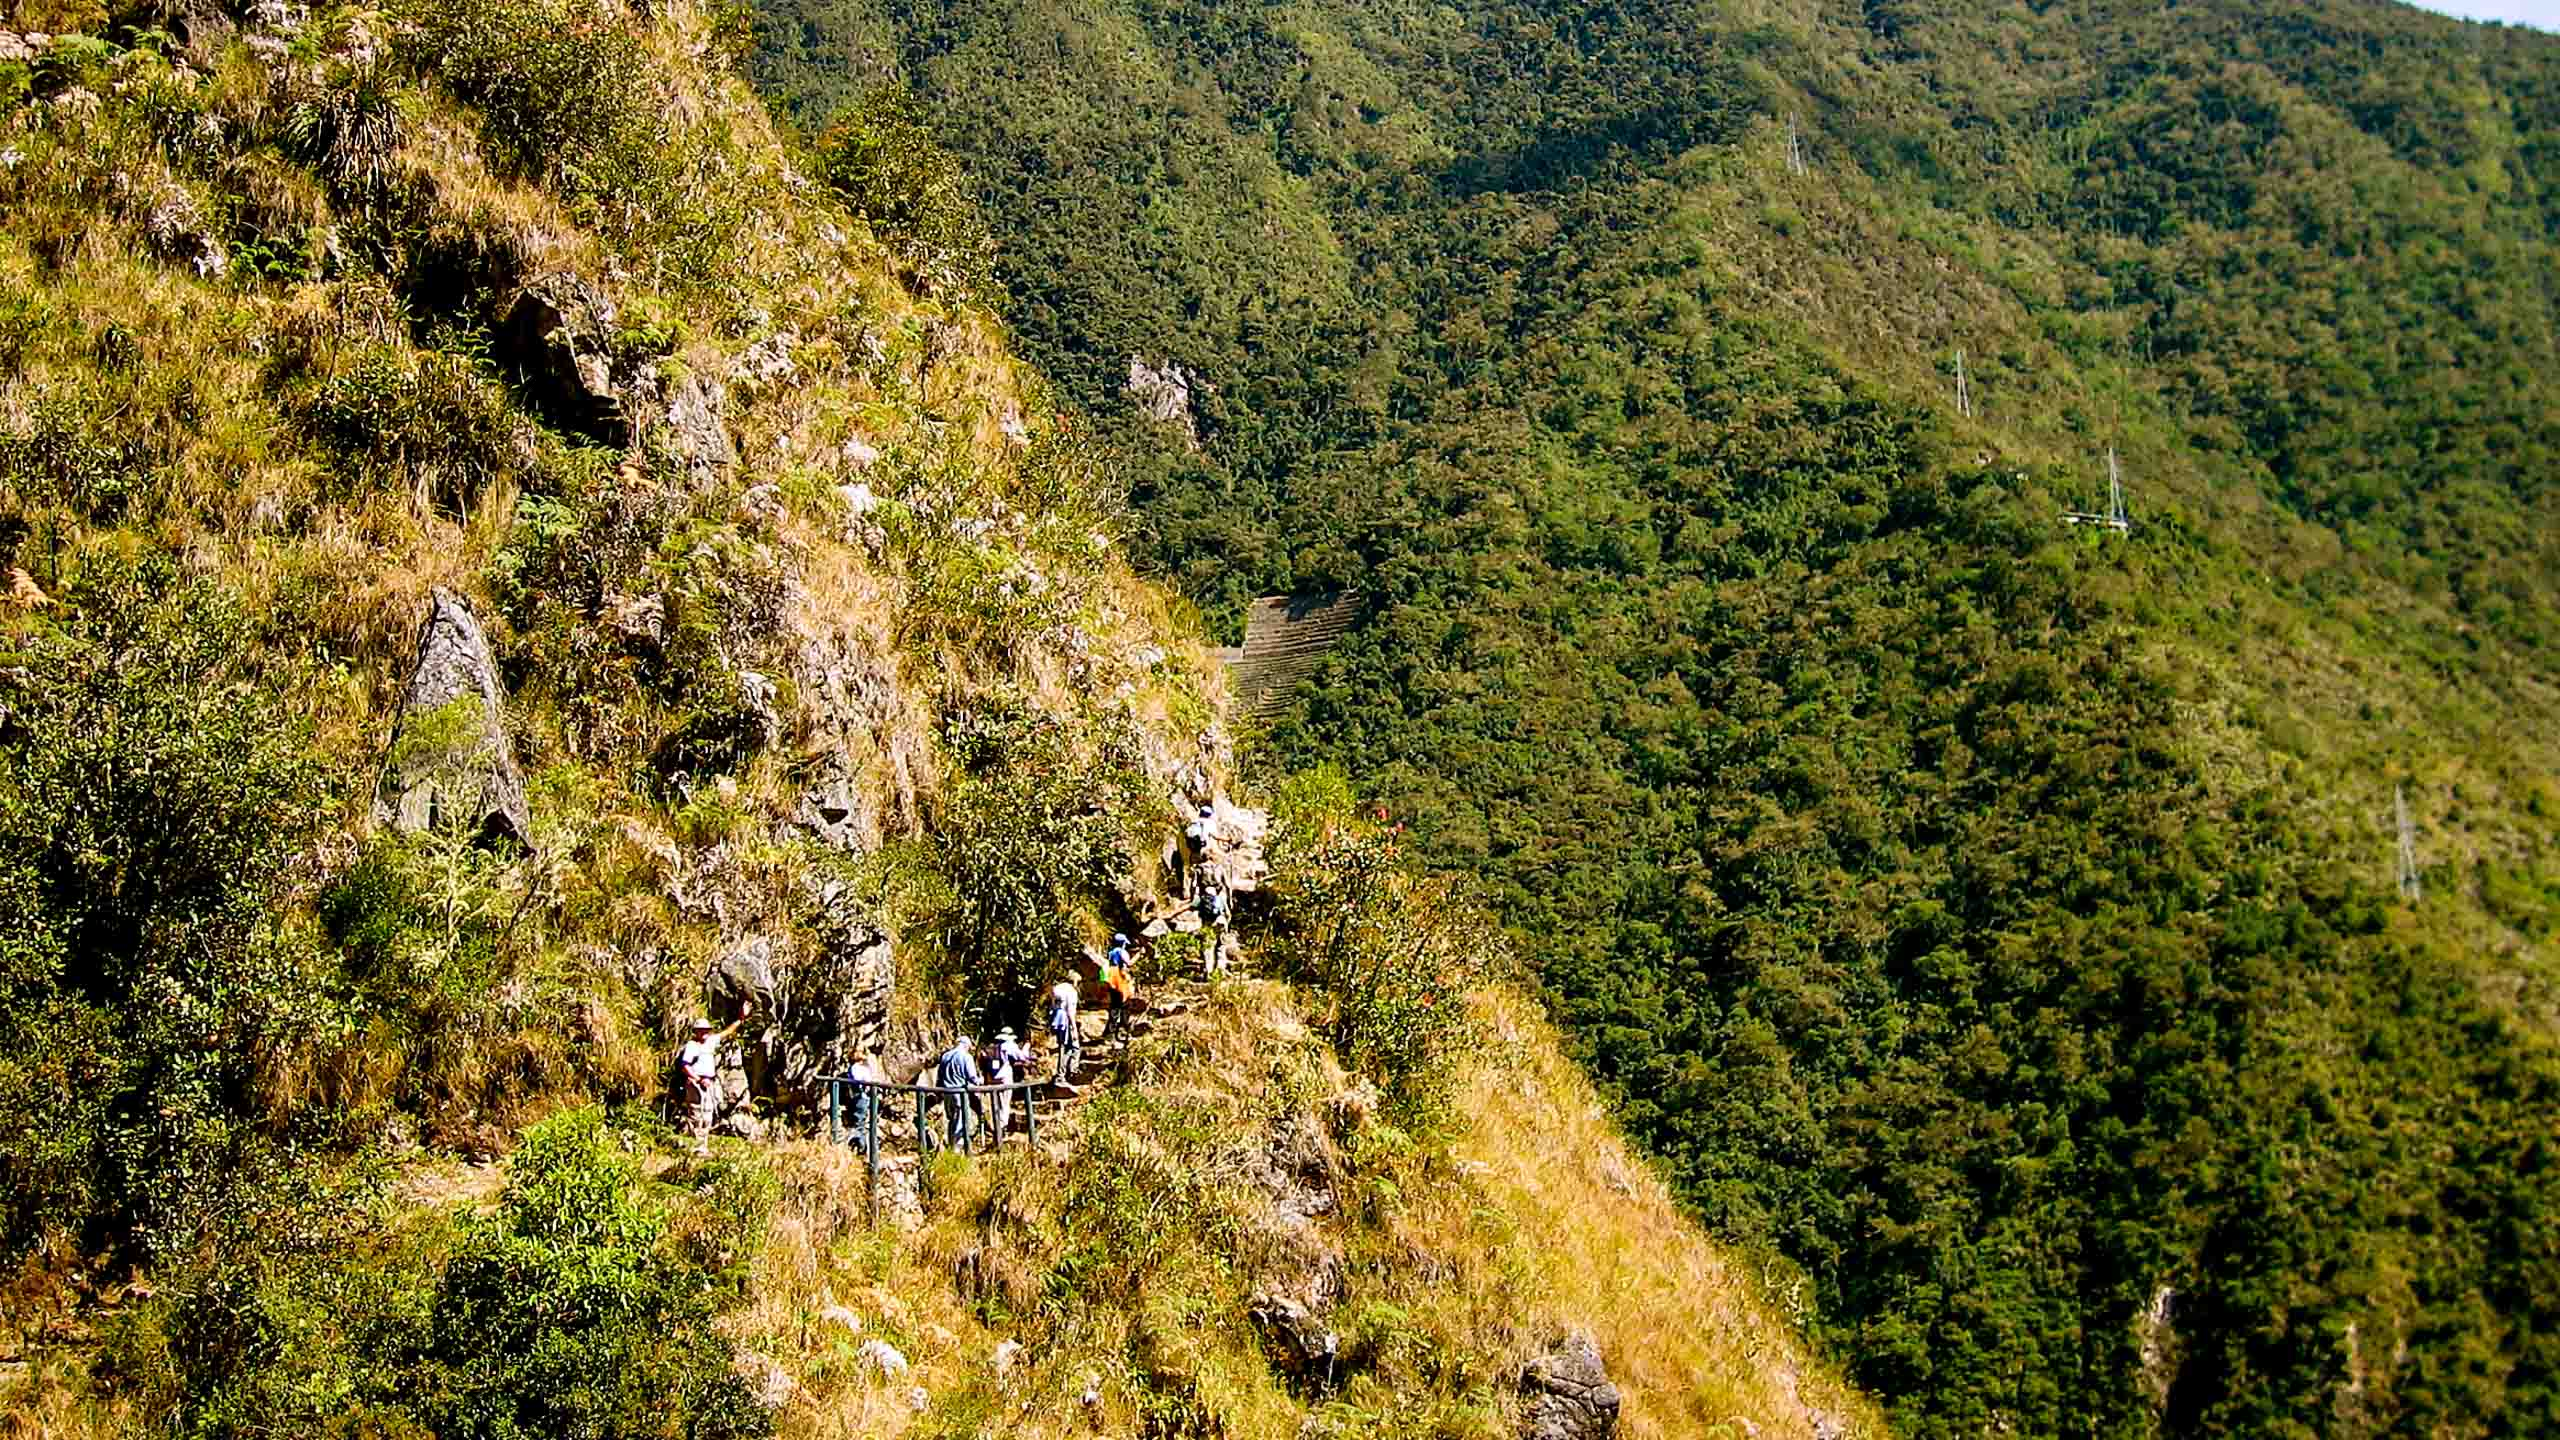 Peru travel group hikes Inca trails